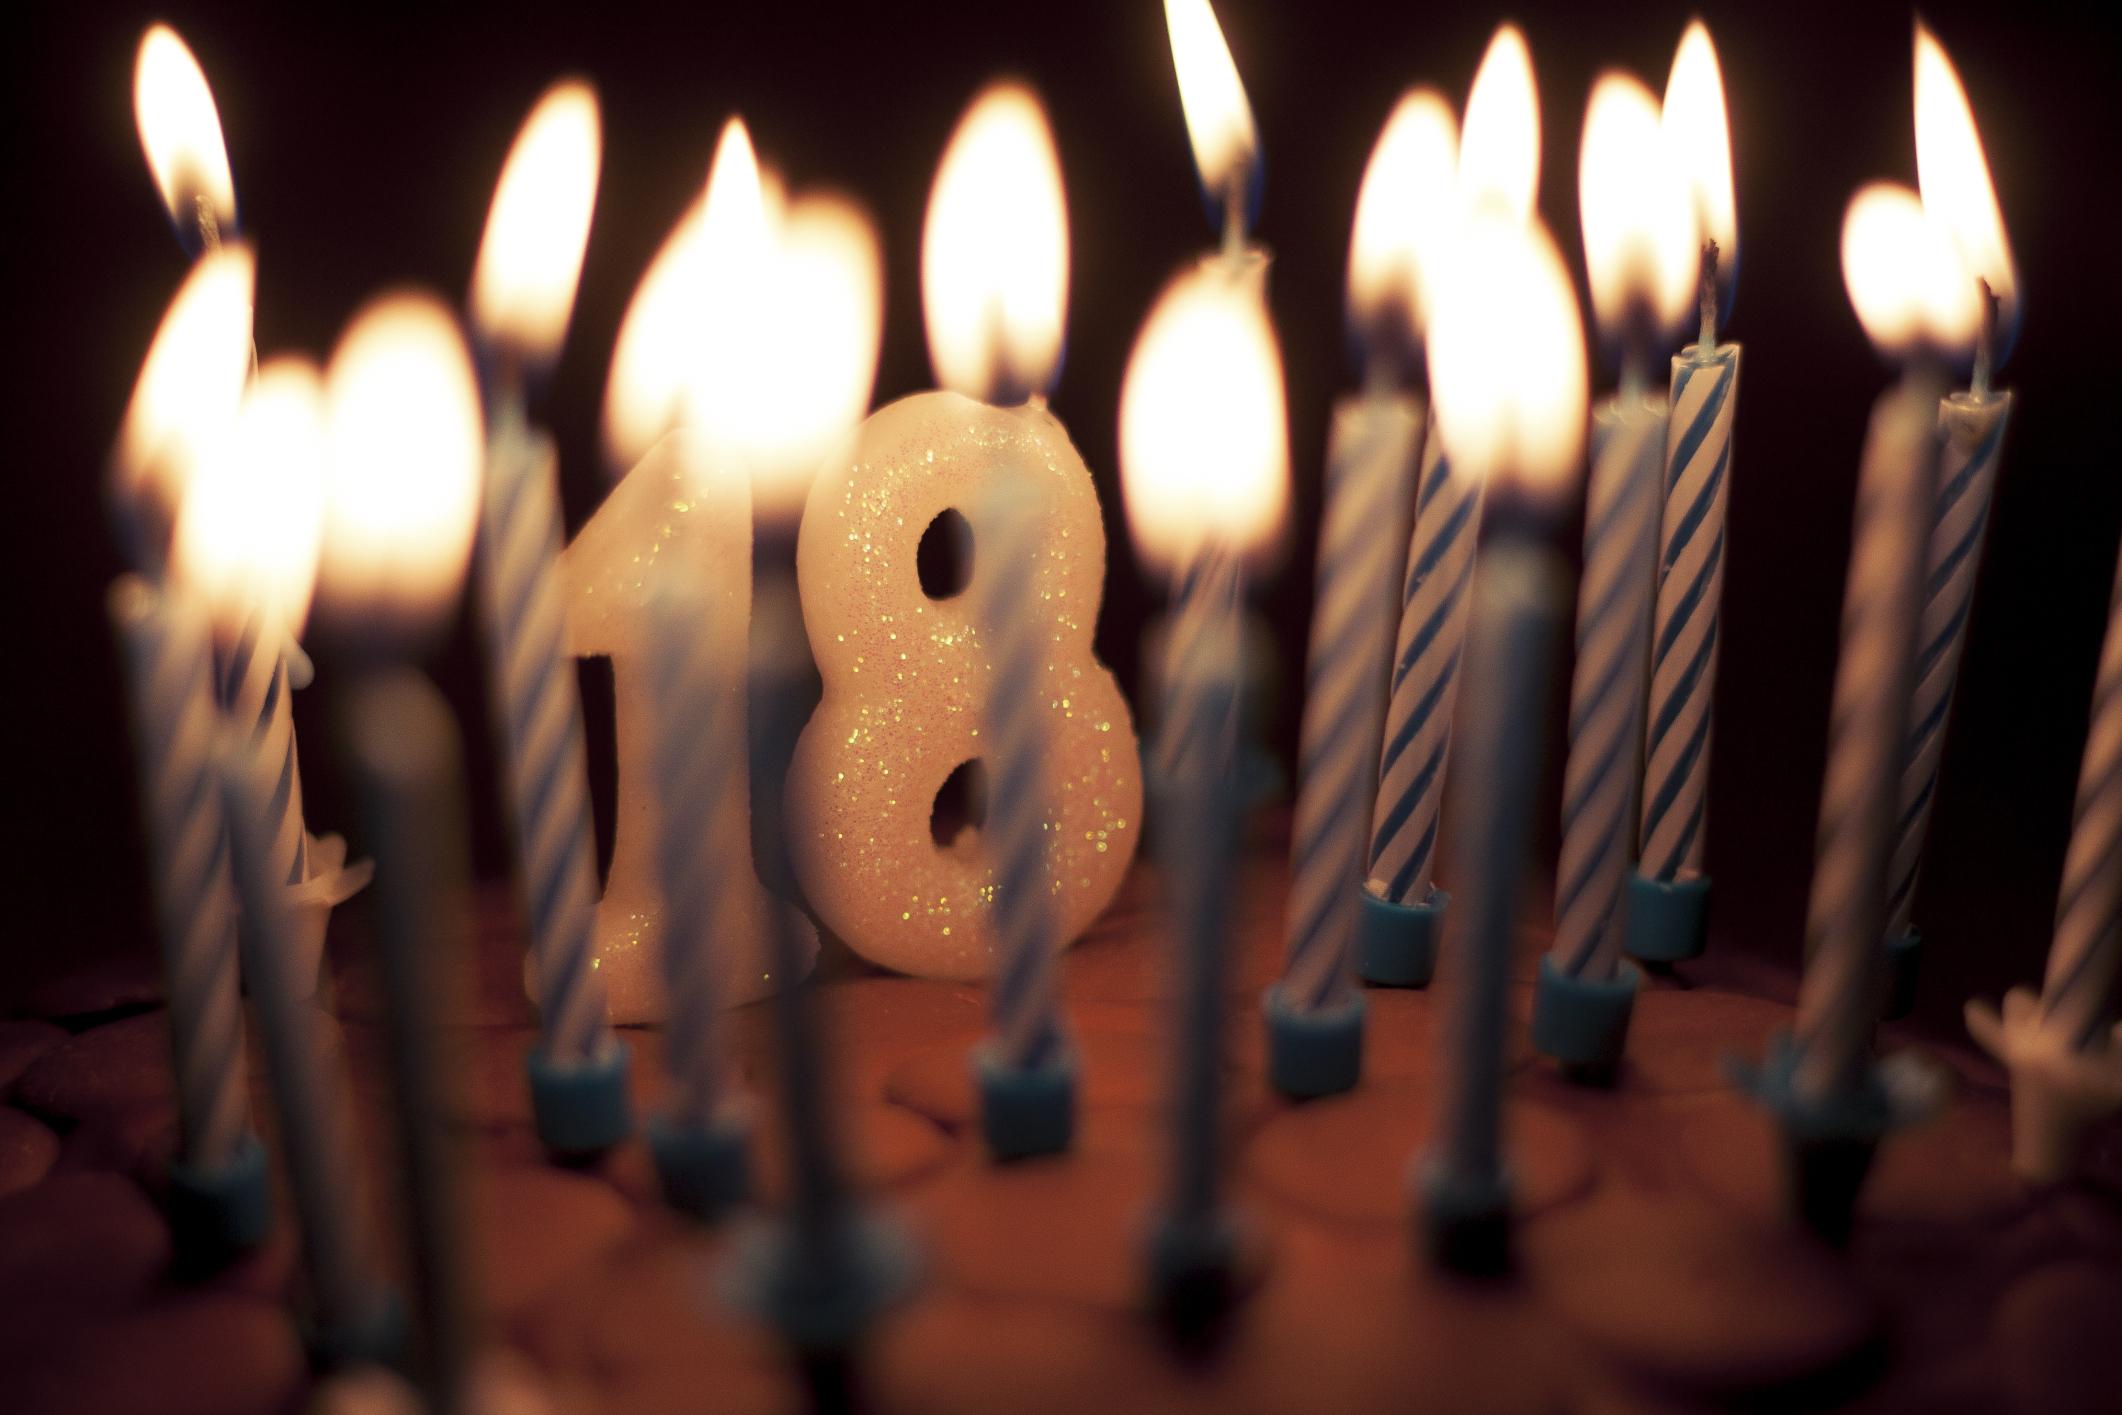 18 candles birthday cake